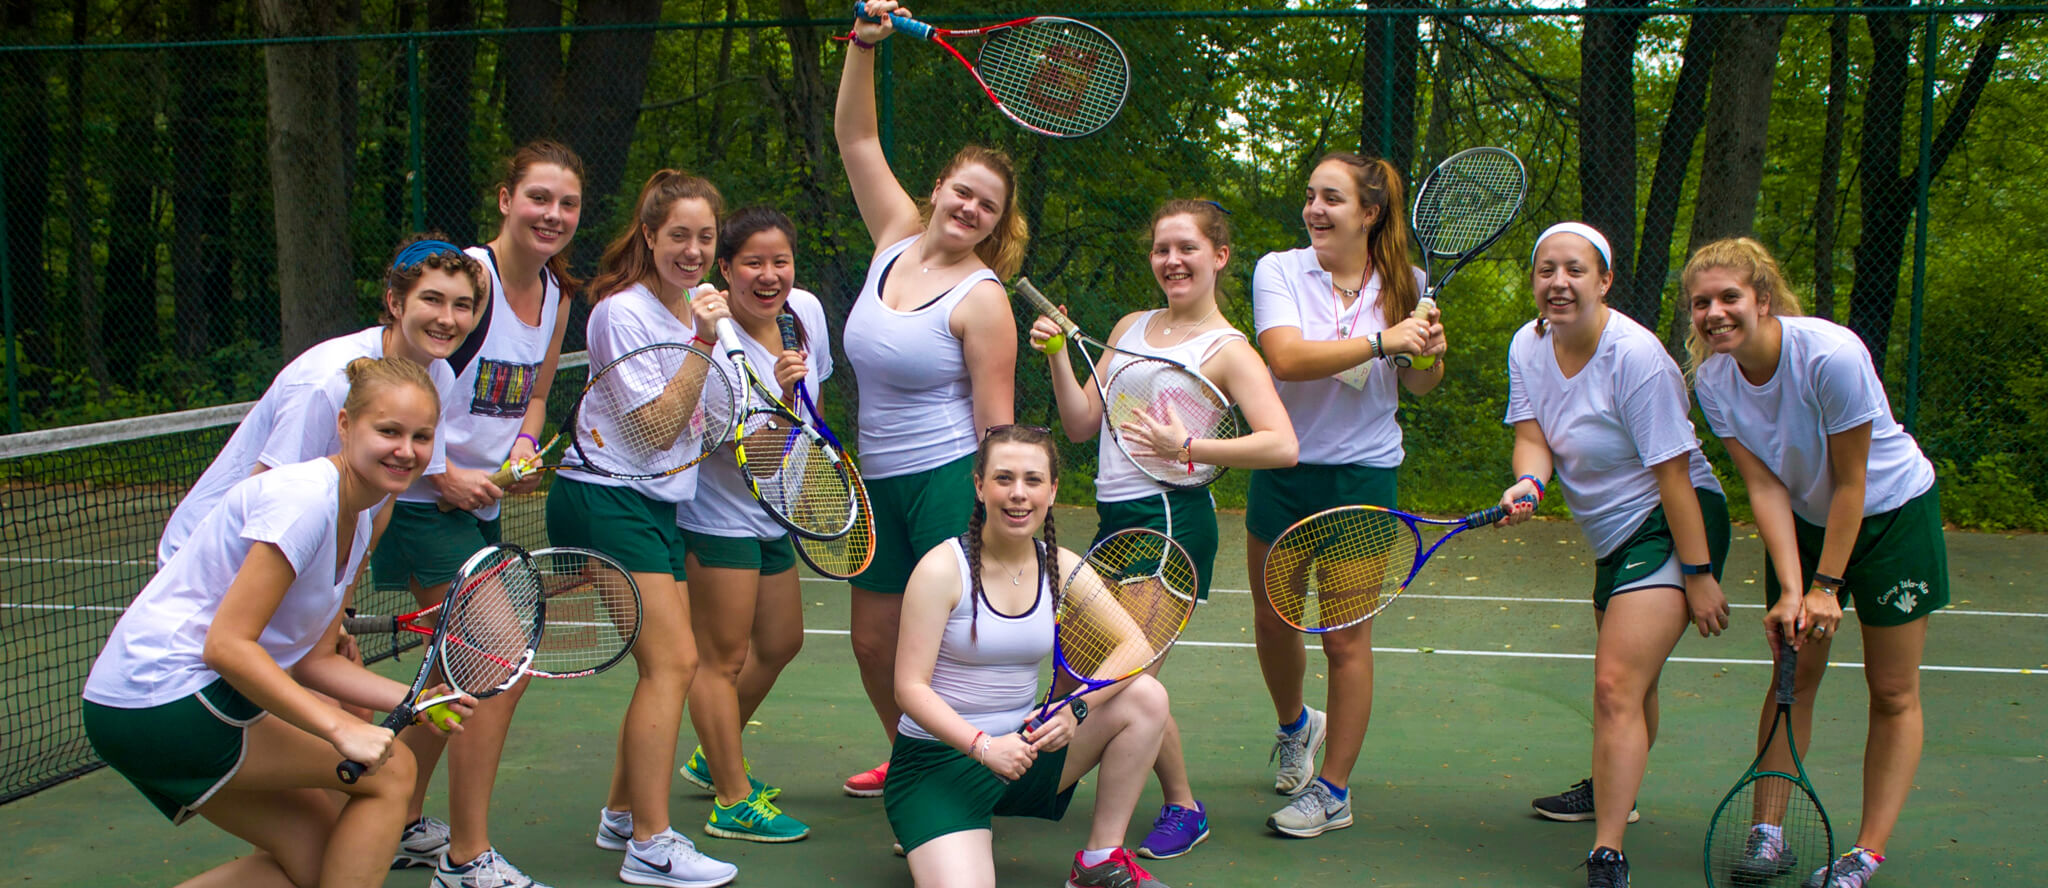 tennis instructor jobs in america